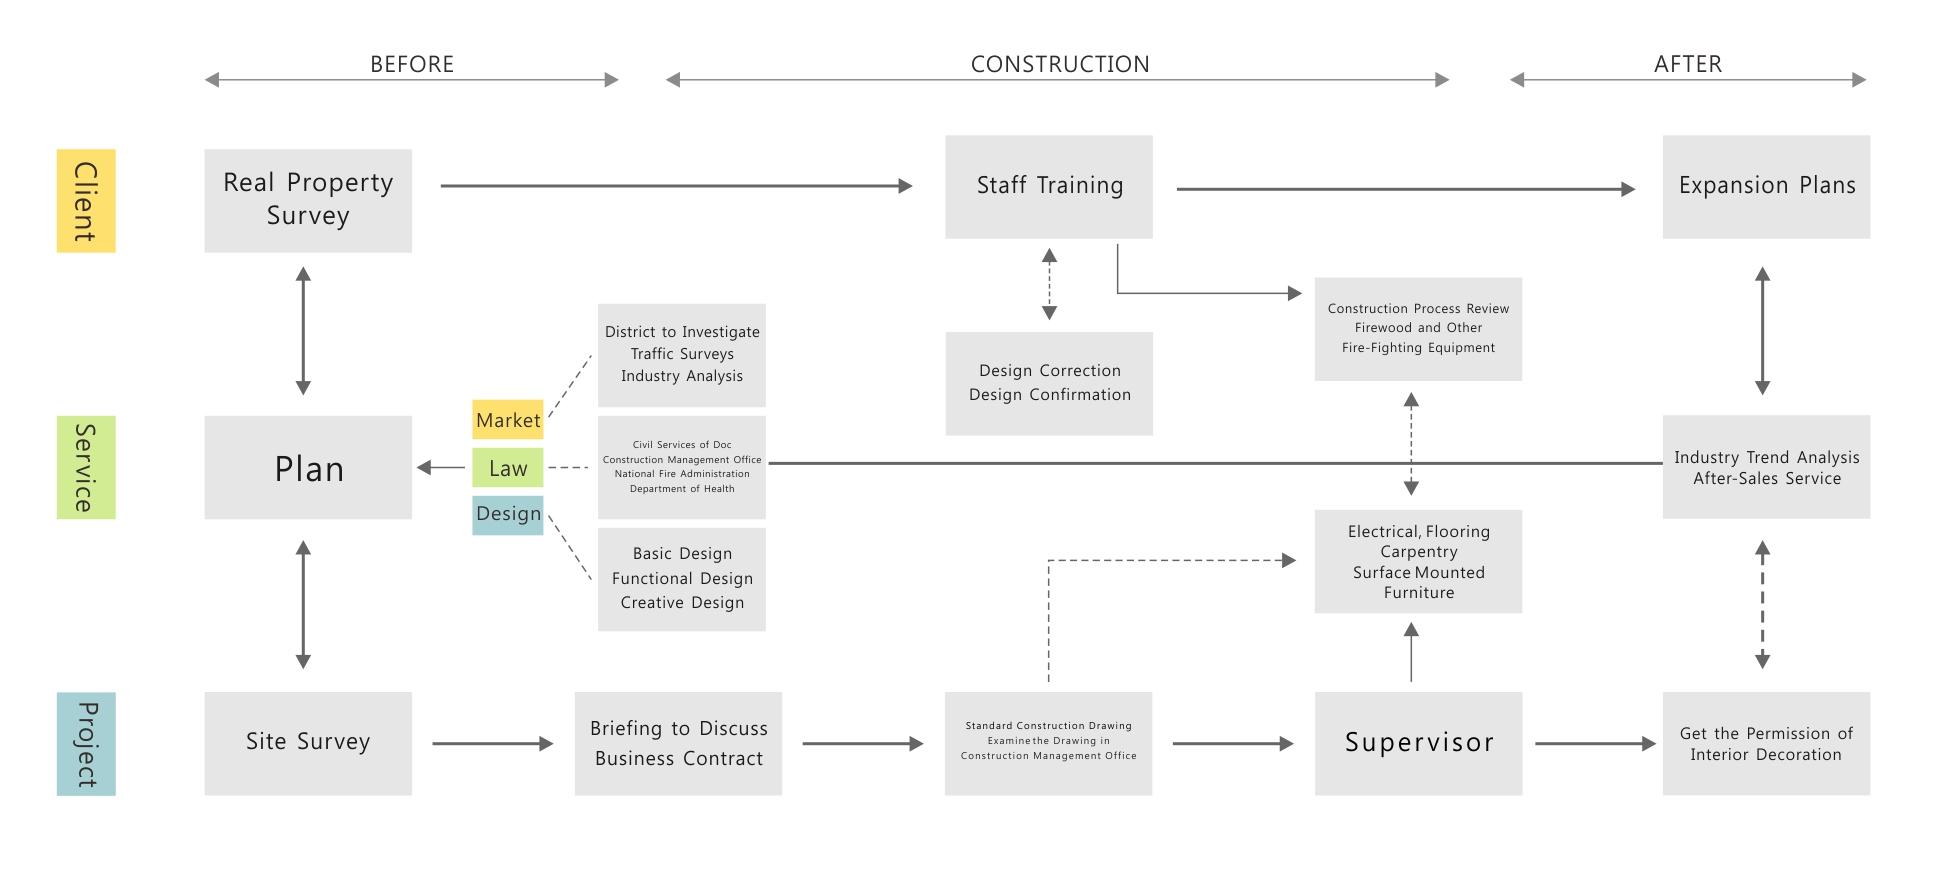 Eiffel design design flow chart construction flow chart flowchart of whole plan geenschuldenfo Choice Image